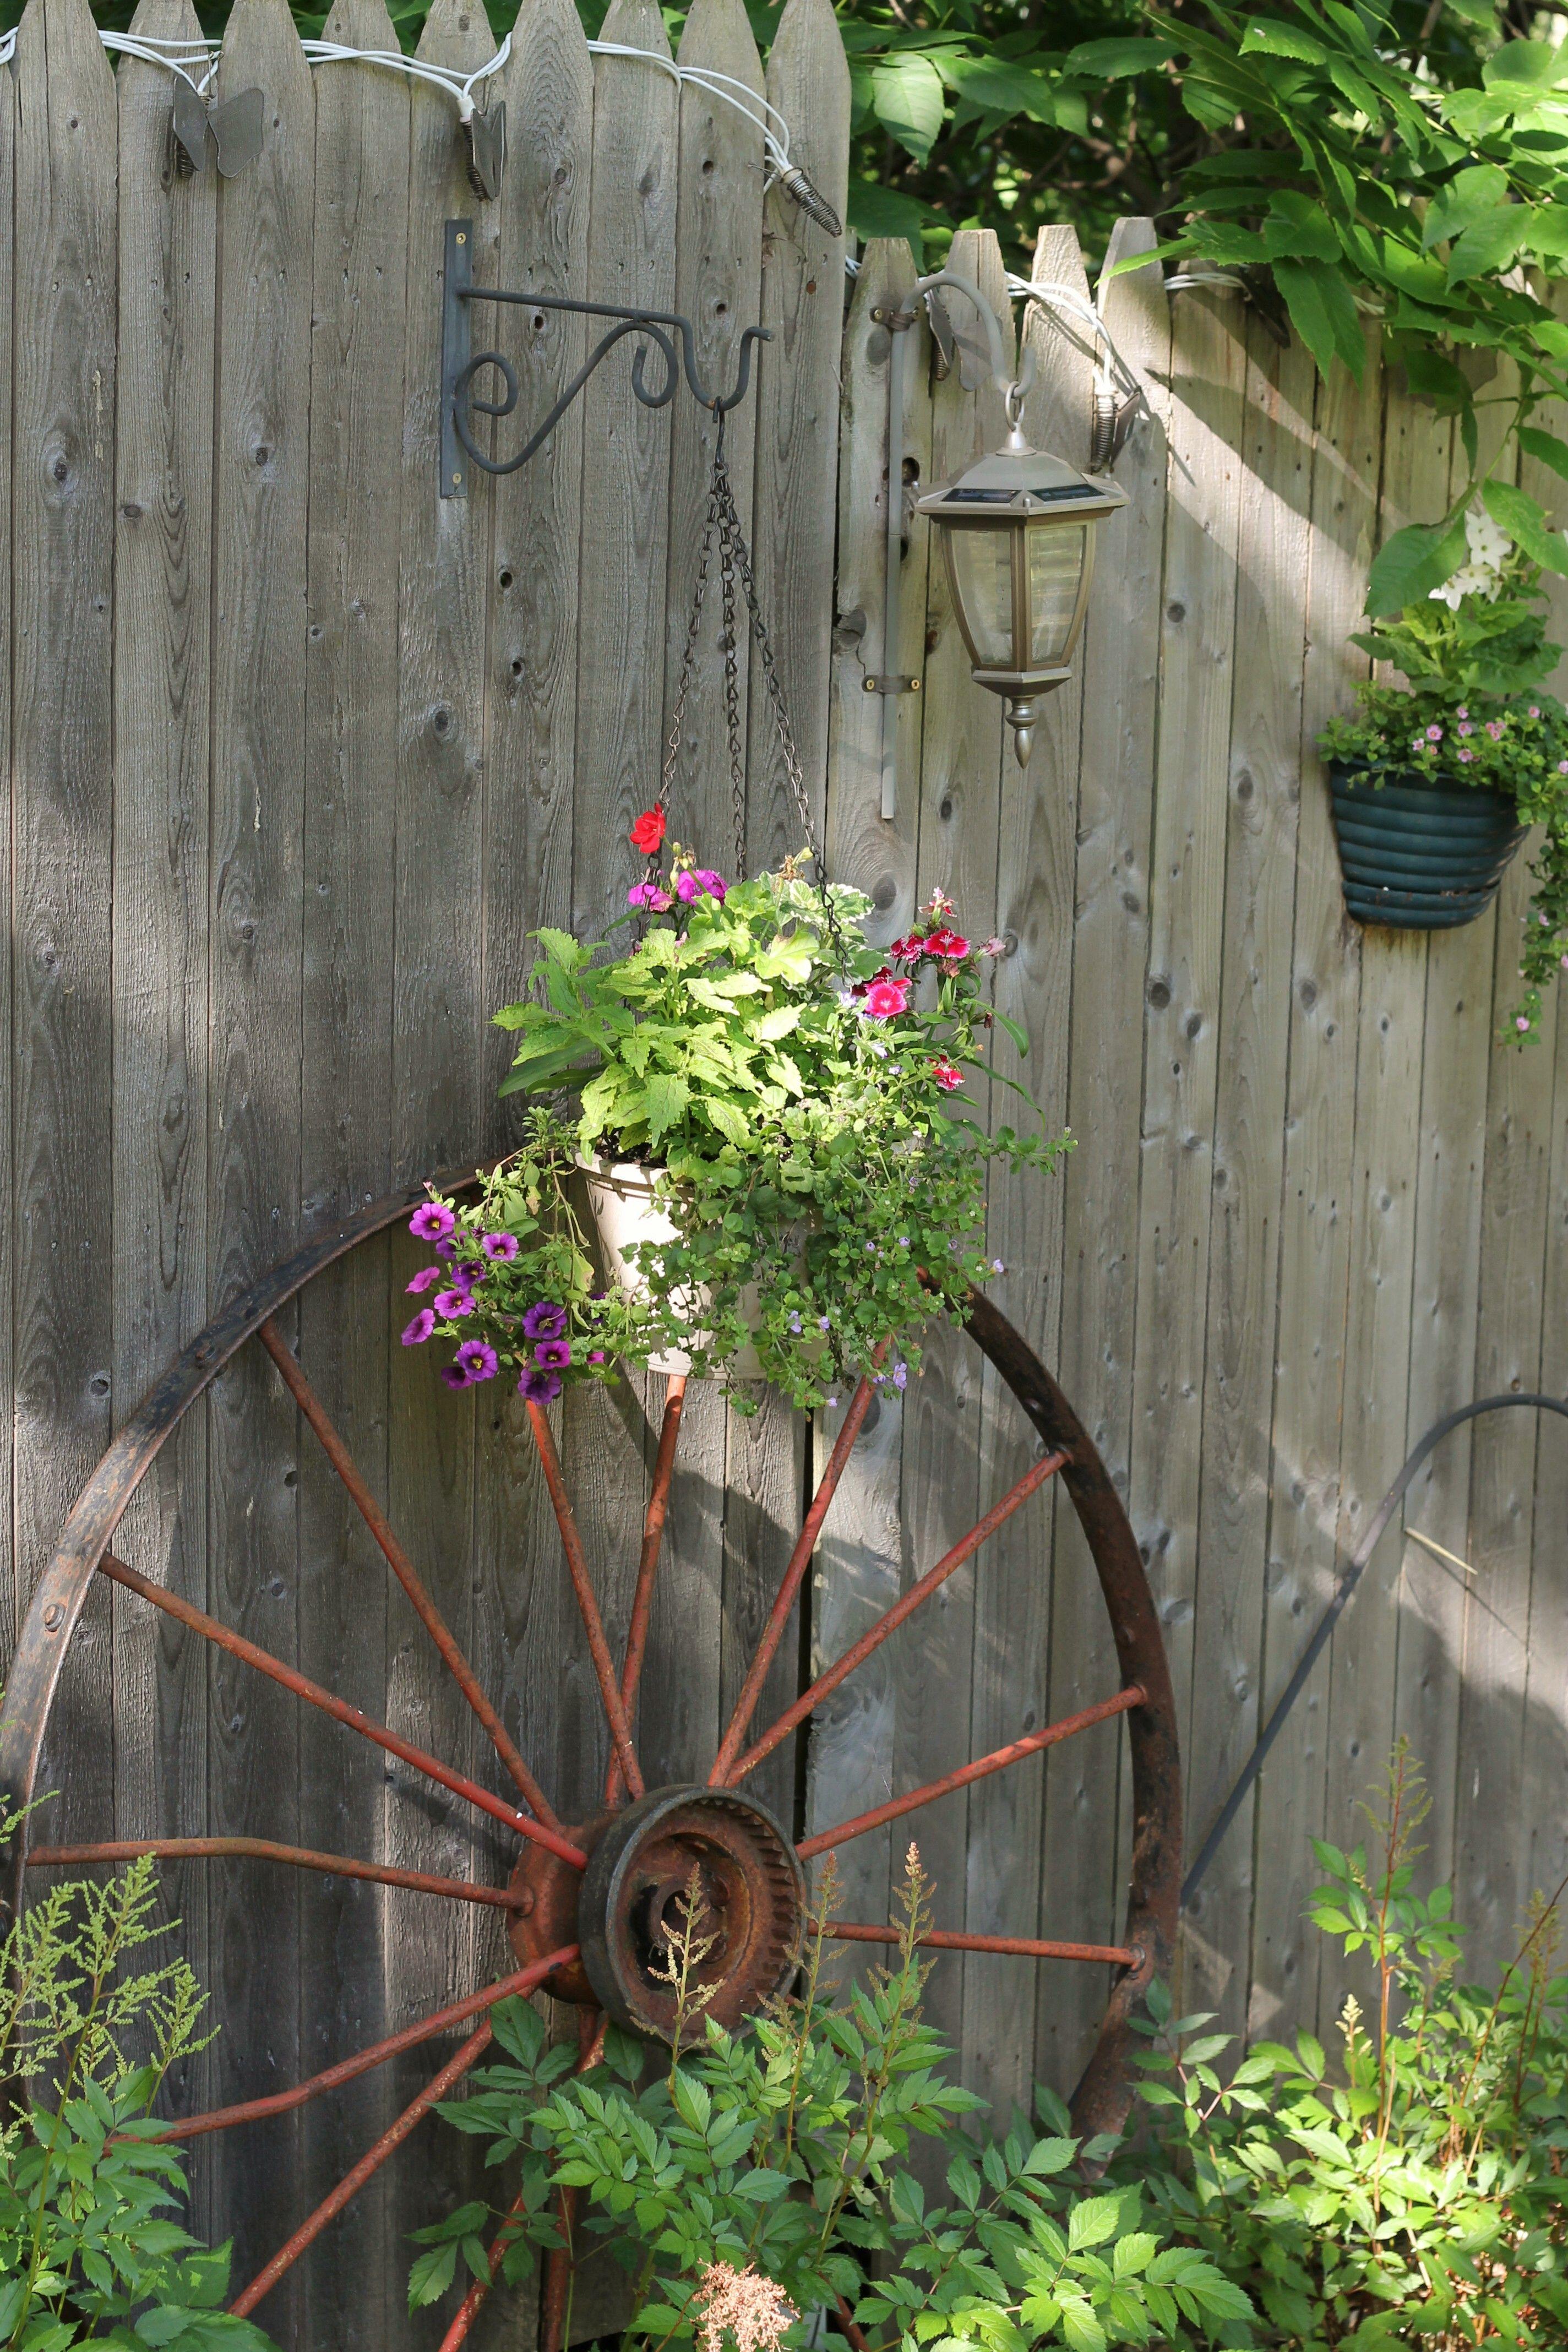 Wagon Wheel Rustic Fence